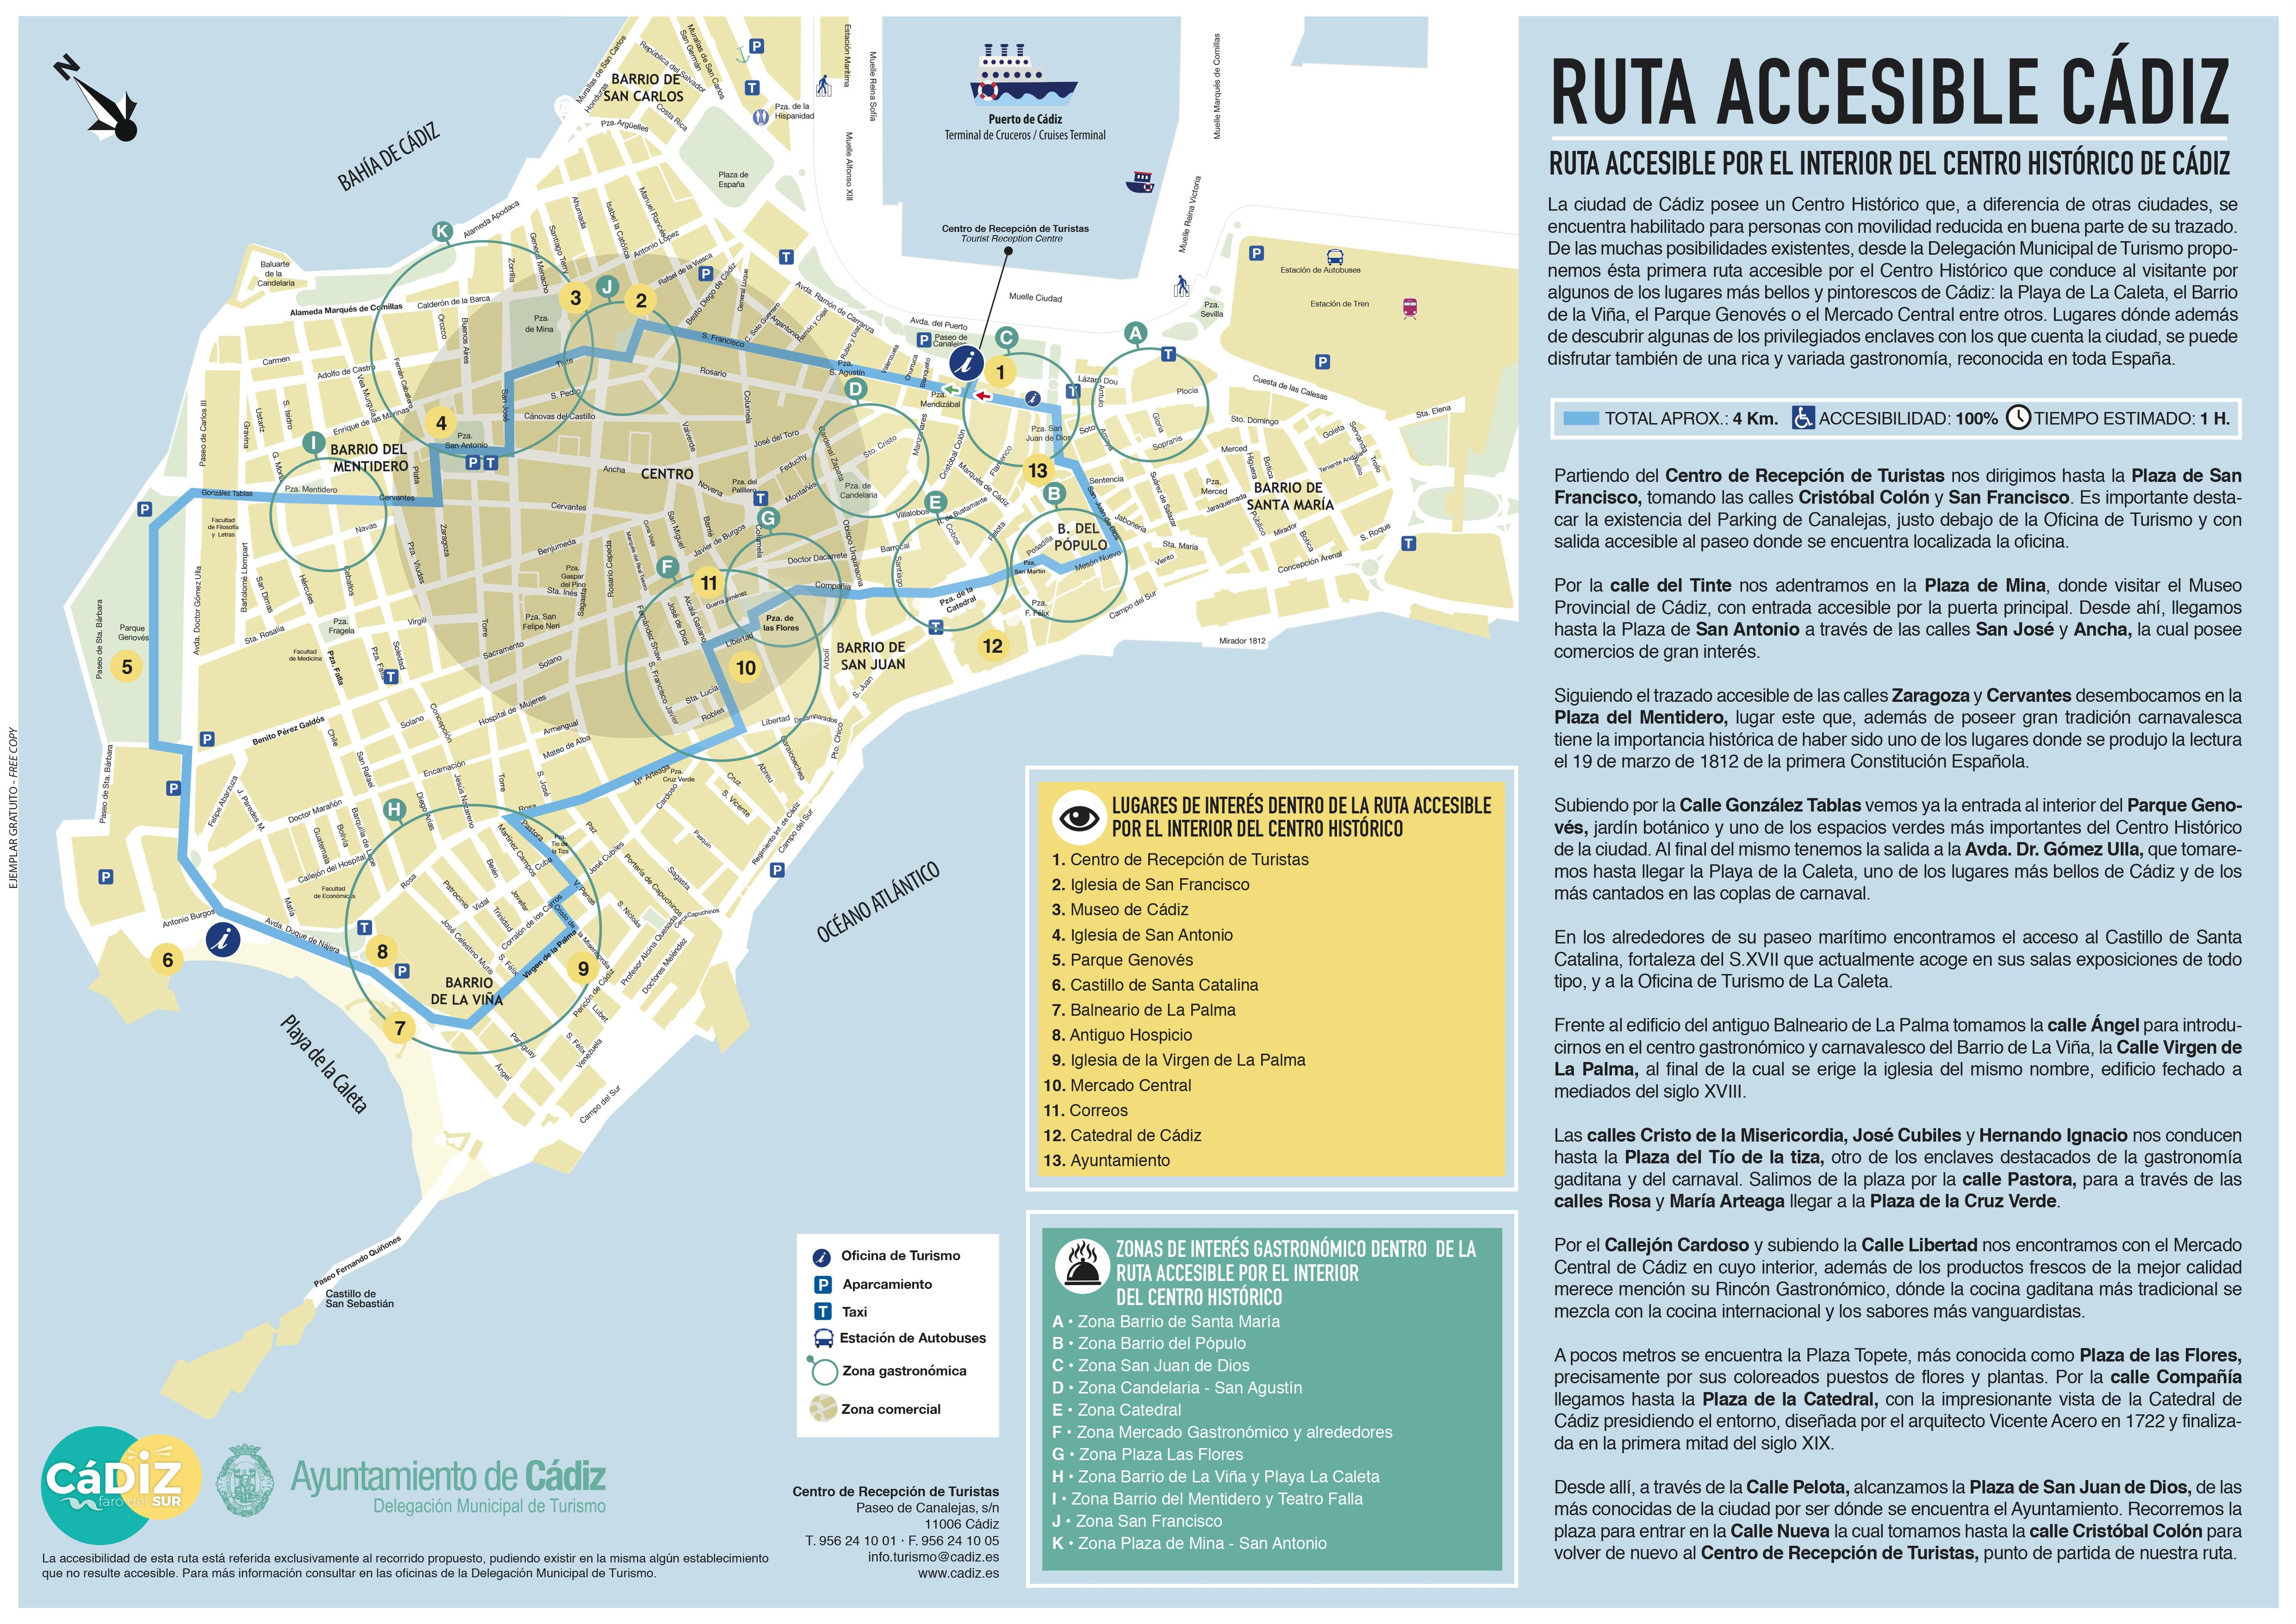 RUTA ACCESIBLE-1